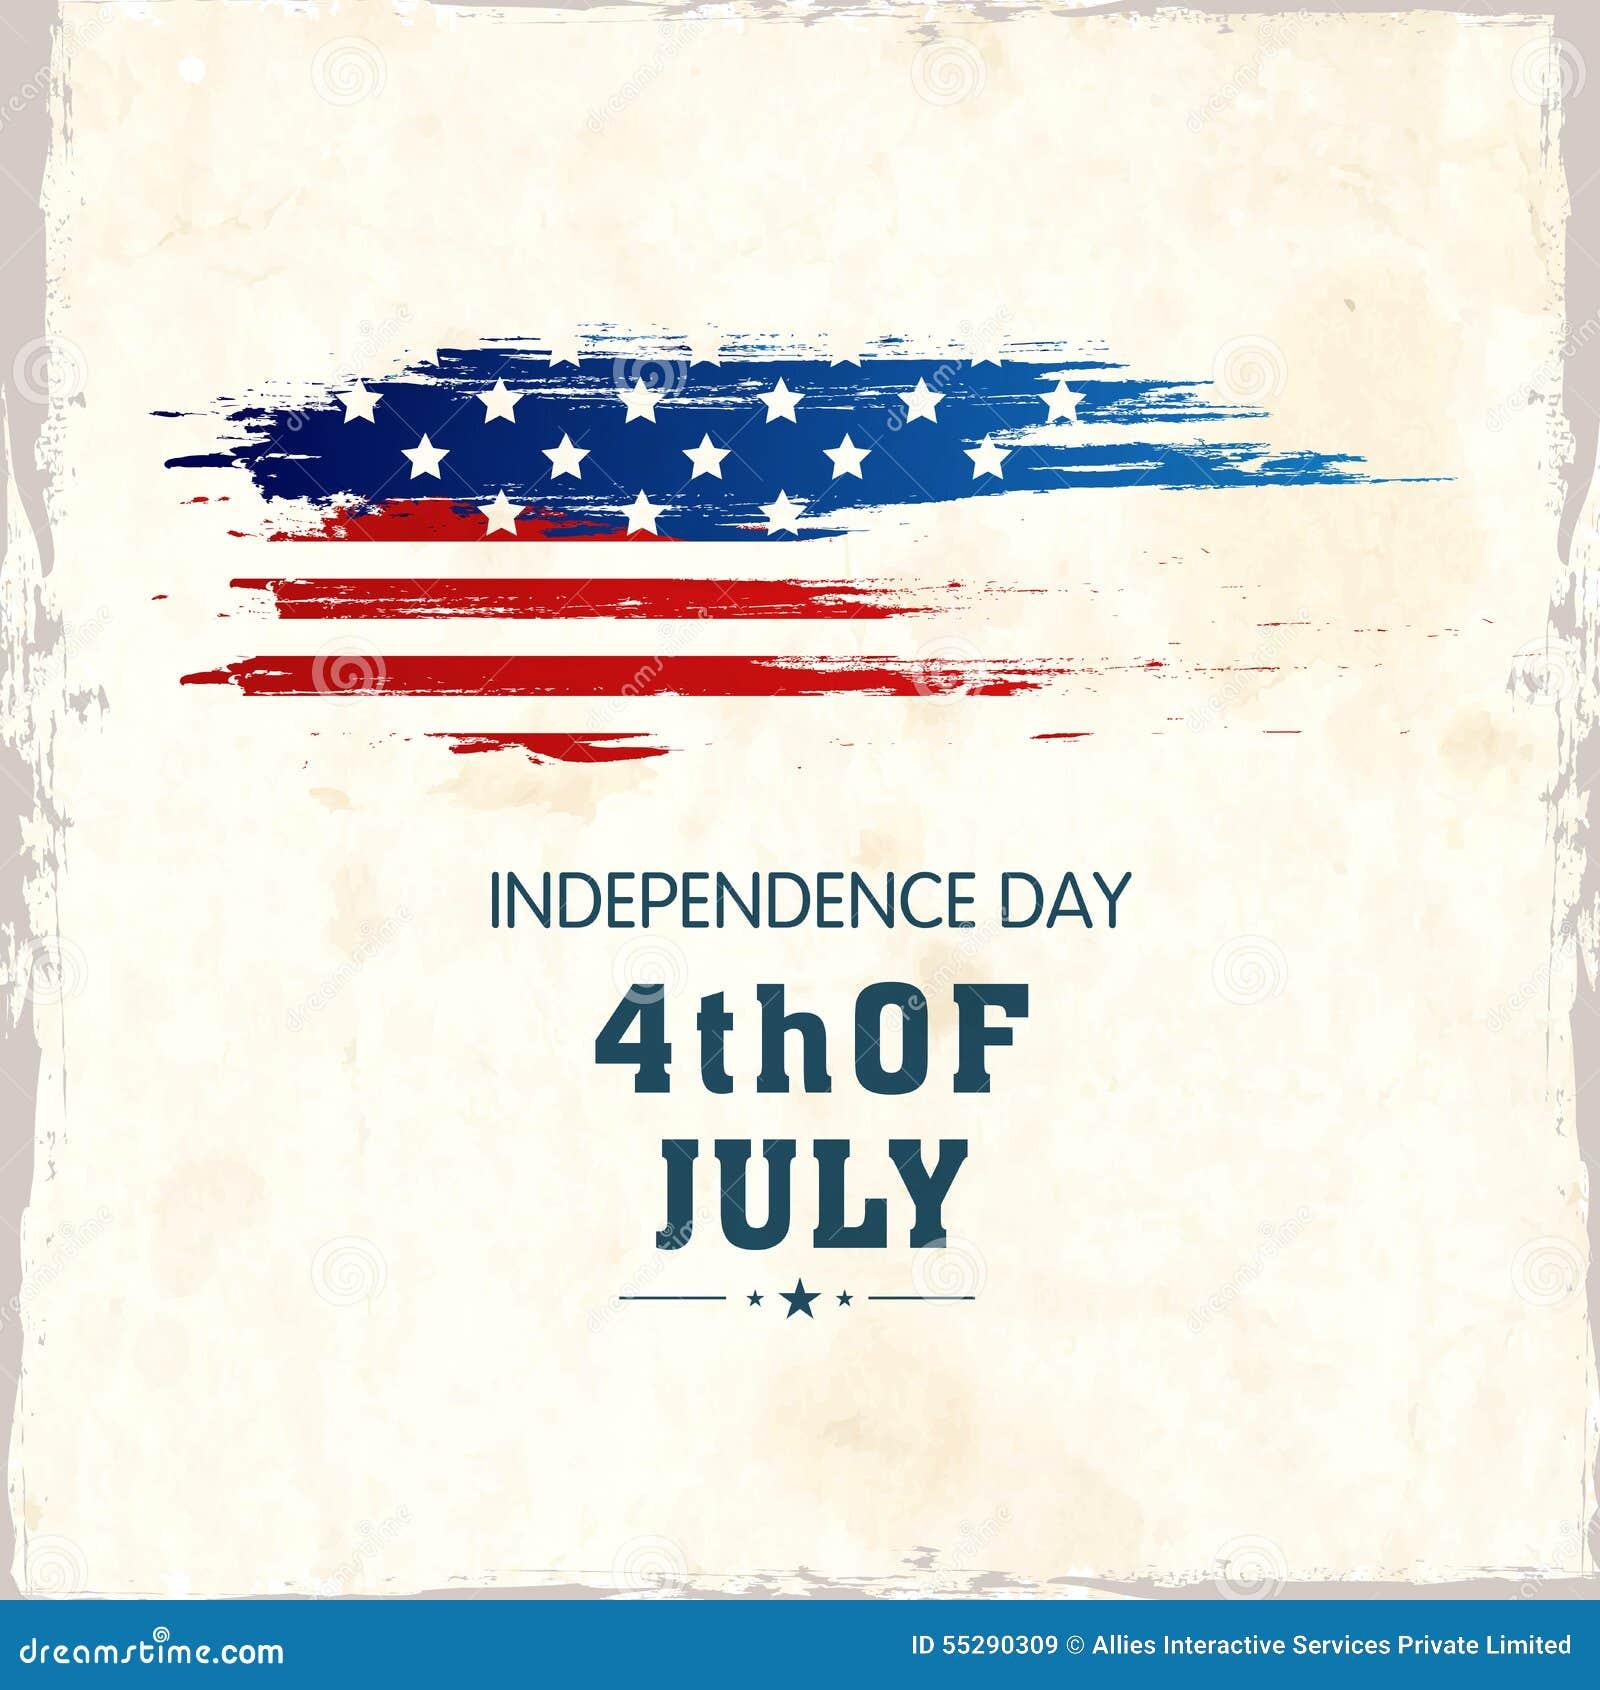 American Independence Day Celebration Poster, Or Banner Design.